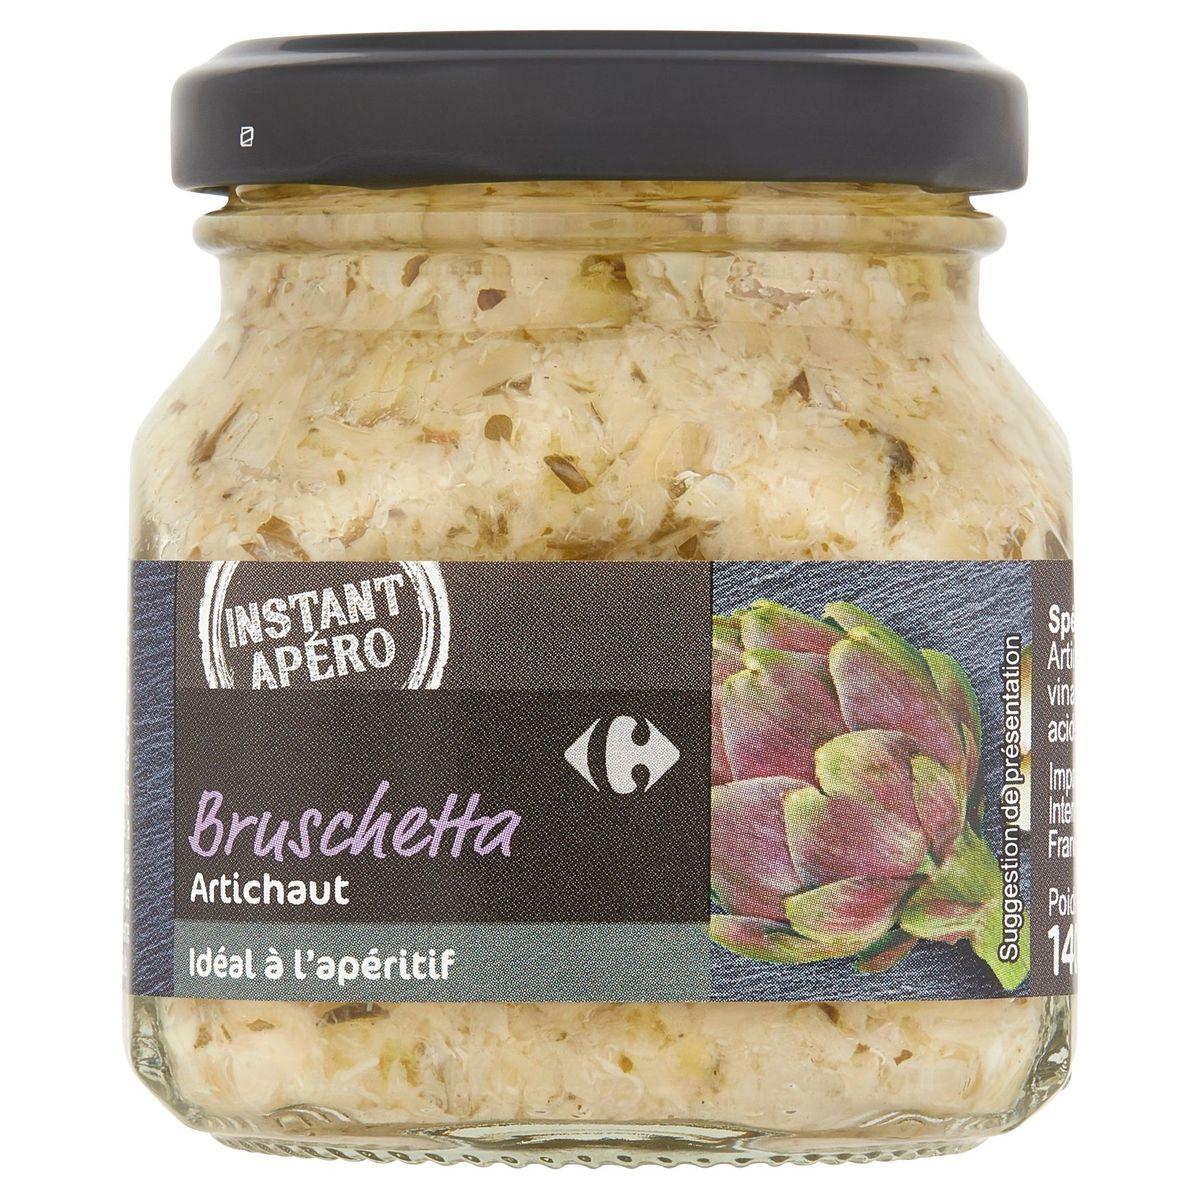 Carrefour Instant Apéro Bruschetta Artichaut 140 g